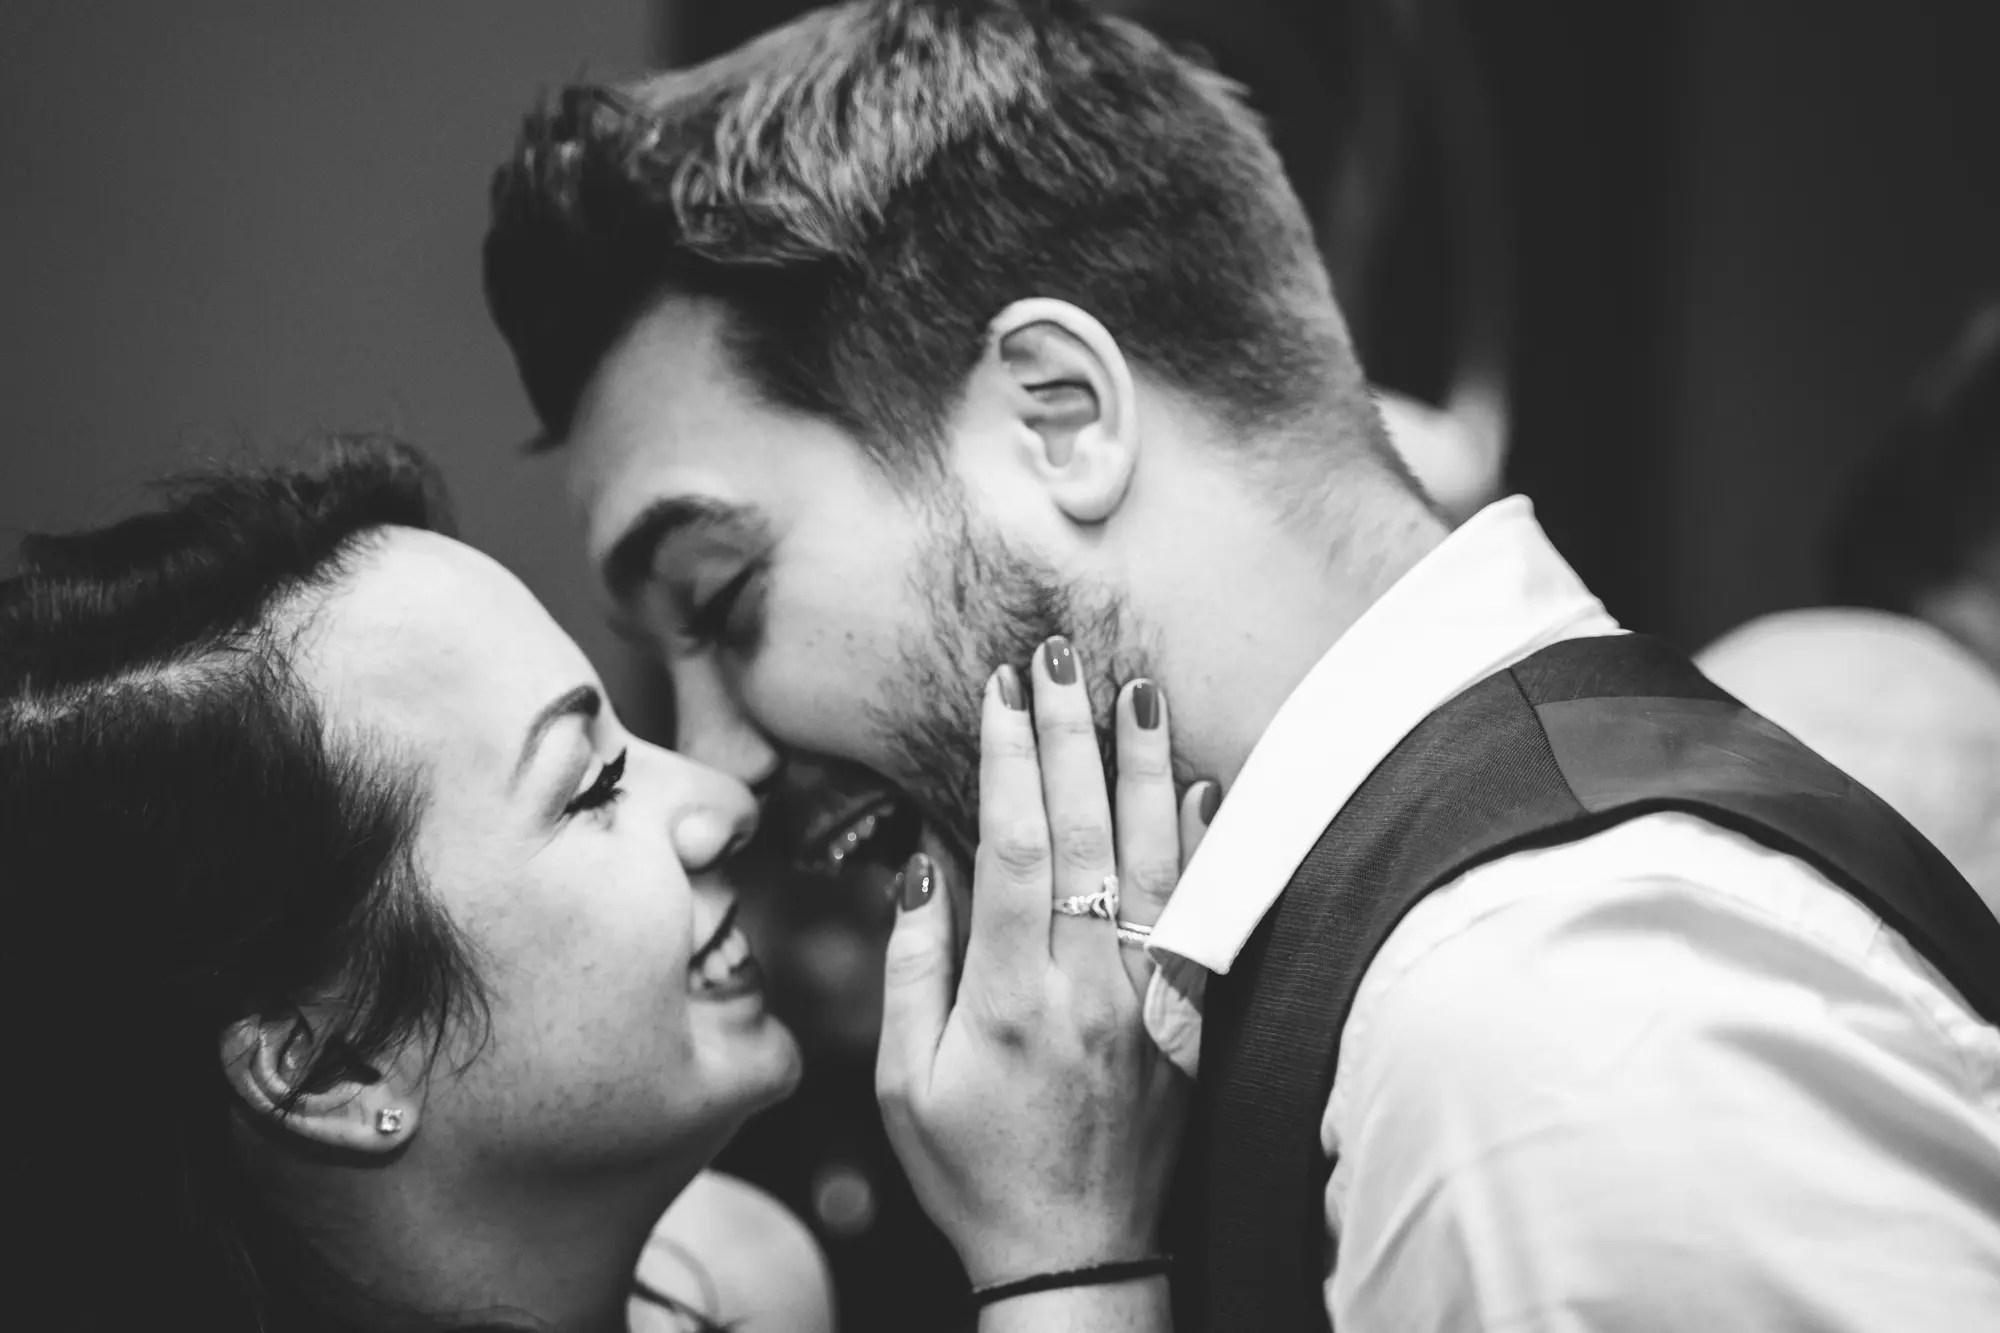 Declan west photography - engagement party photographer - cute kiss